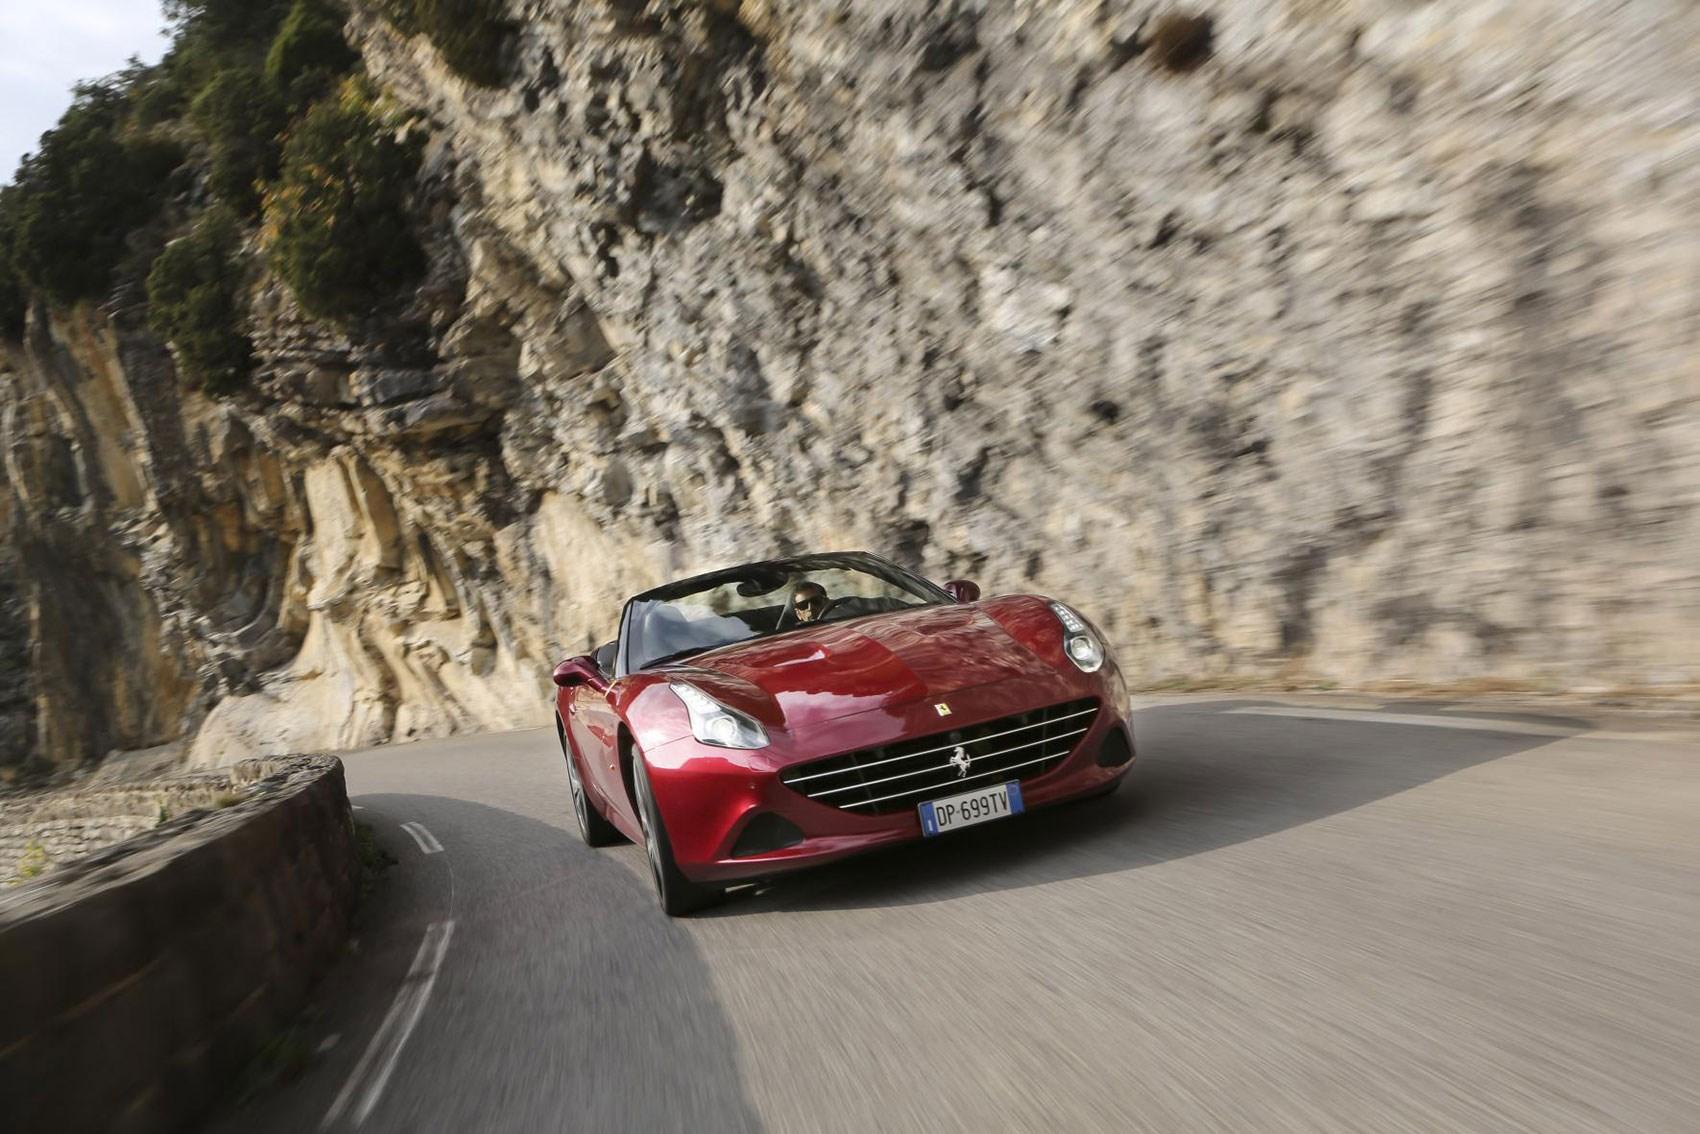 ferrari-california Extraordinary Ferrari Mondial 3.4 T Review Cars Trend